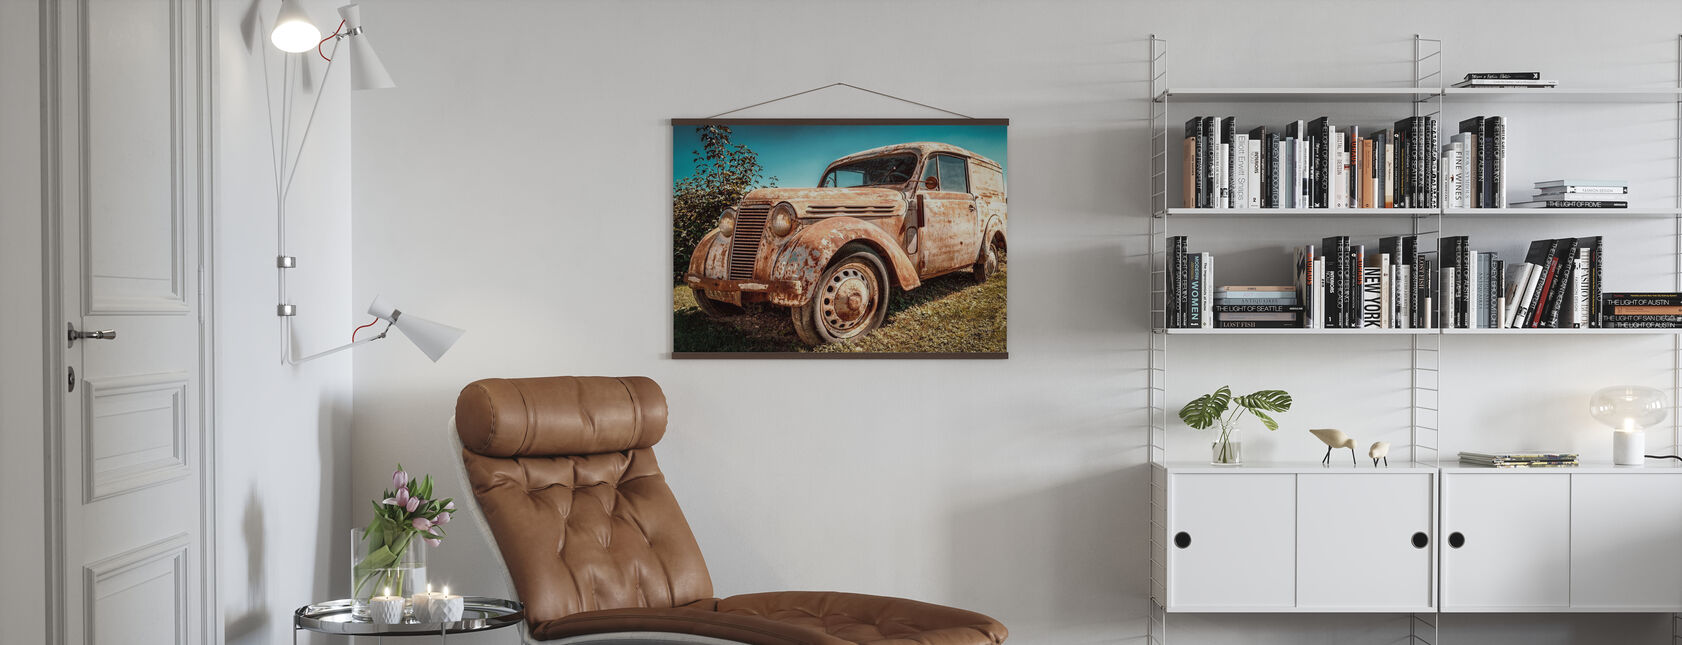 Old Renault Juvaquatre - Poster - Wohnzimmer